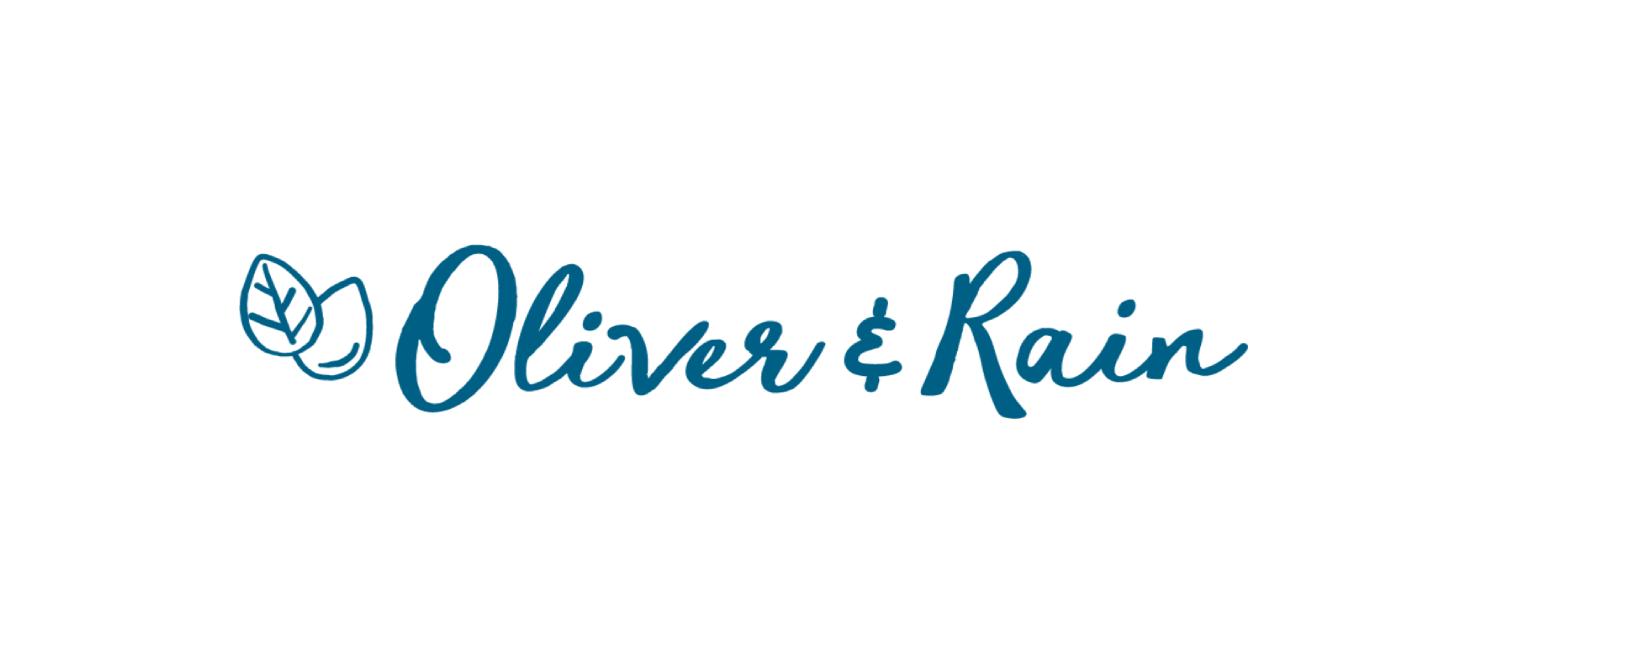 Oliver & Rain Discount Code 2021